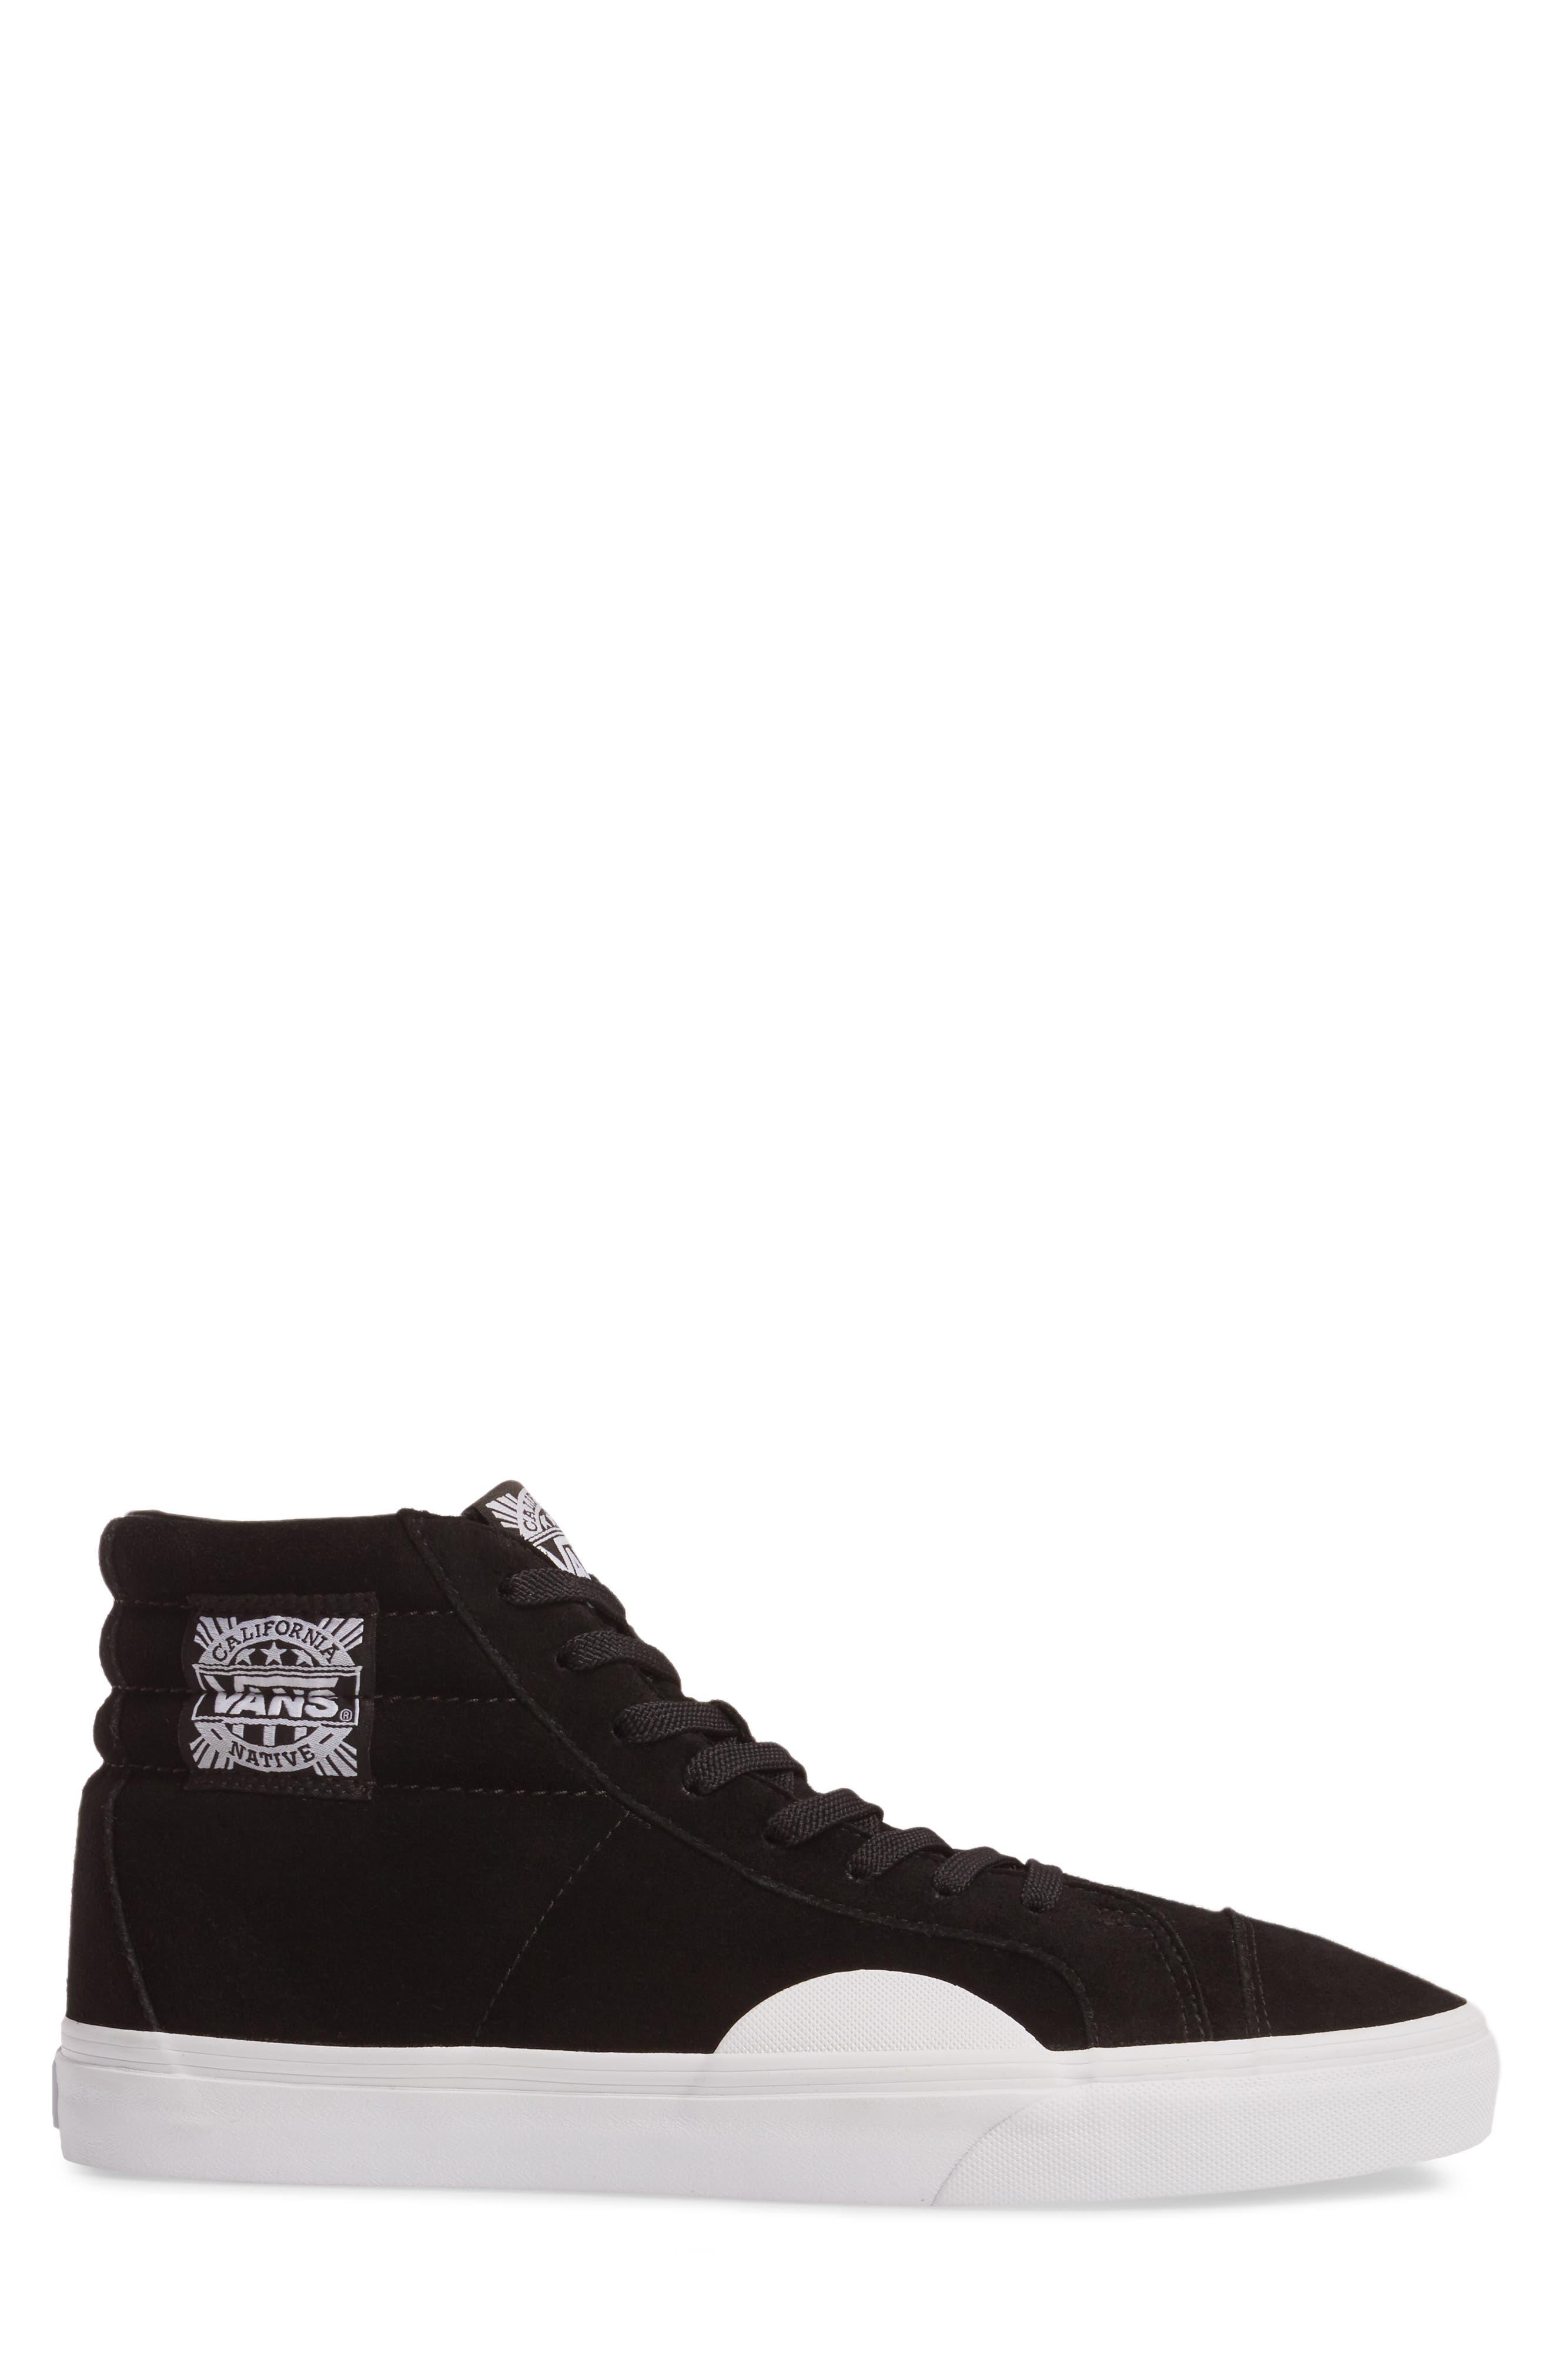 Style 238 Sneaker,                             Alternate thumbnail 3, color,                             001